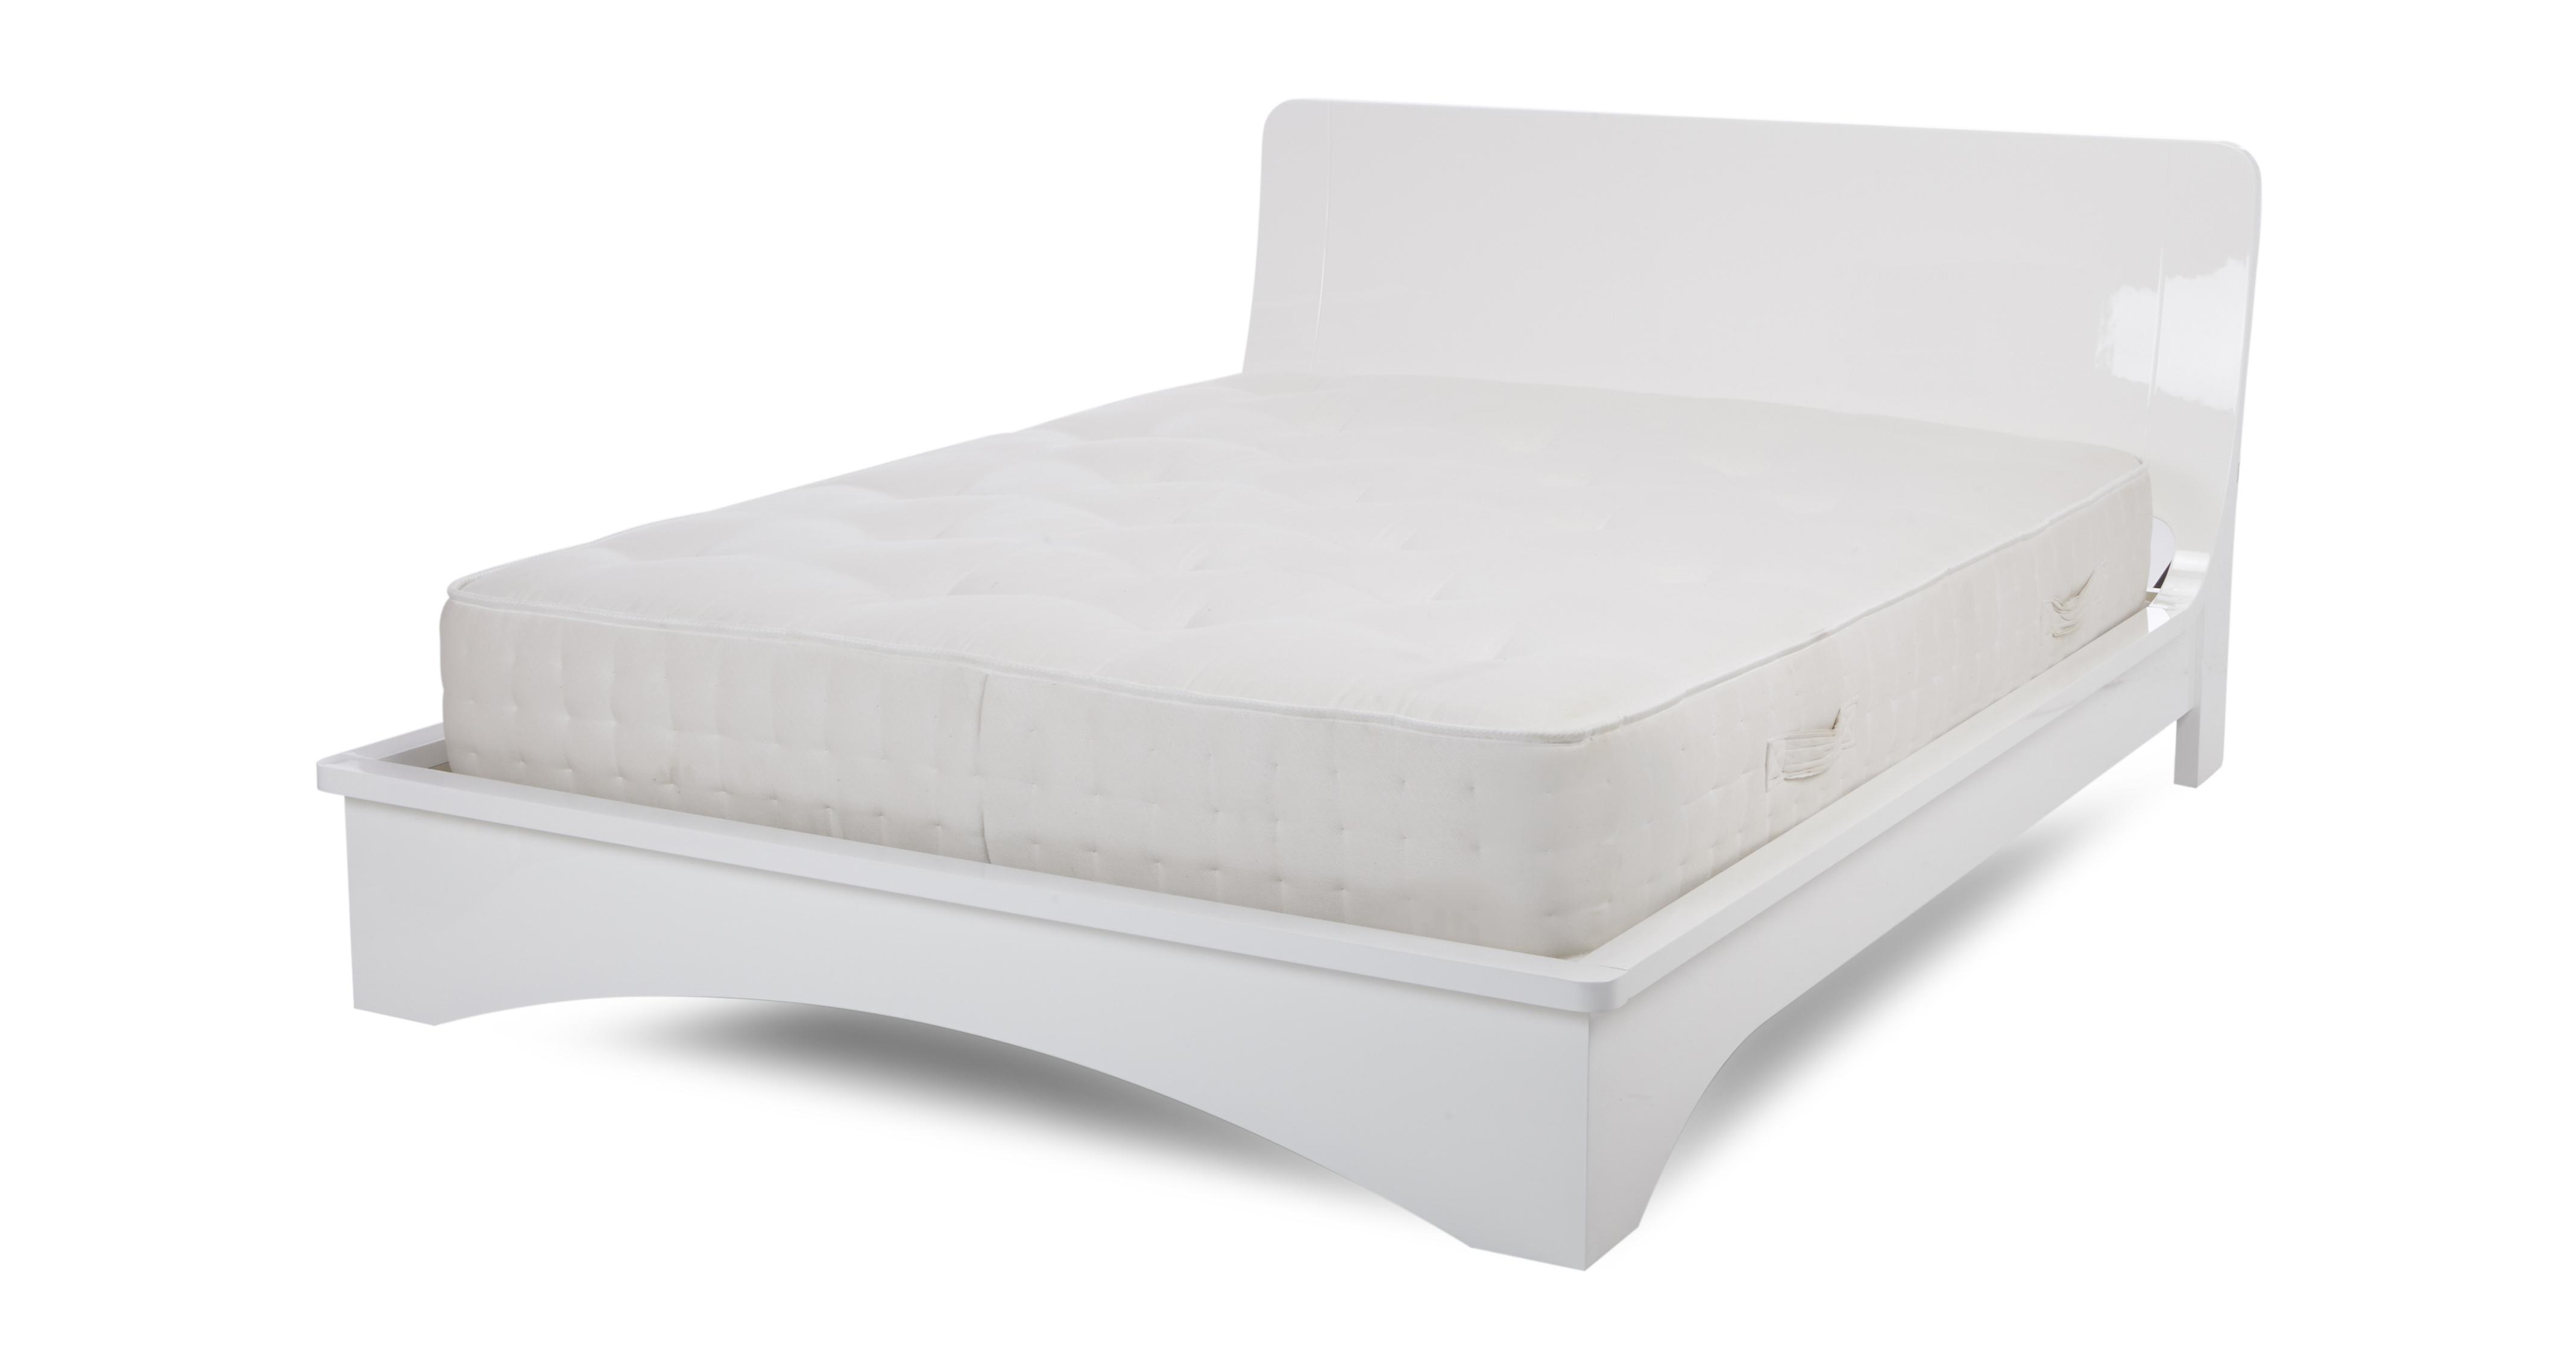 Dfs Eclipse Bedroom Furniture Wwwindiepediaorg - Dfs bedroom furniture sets